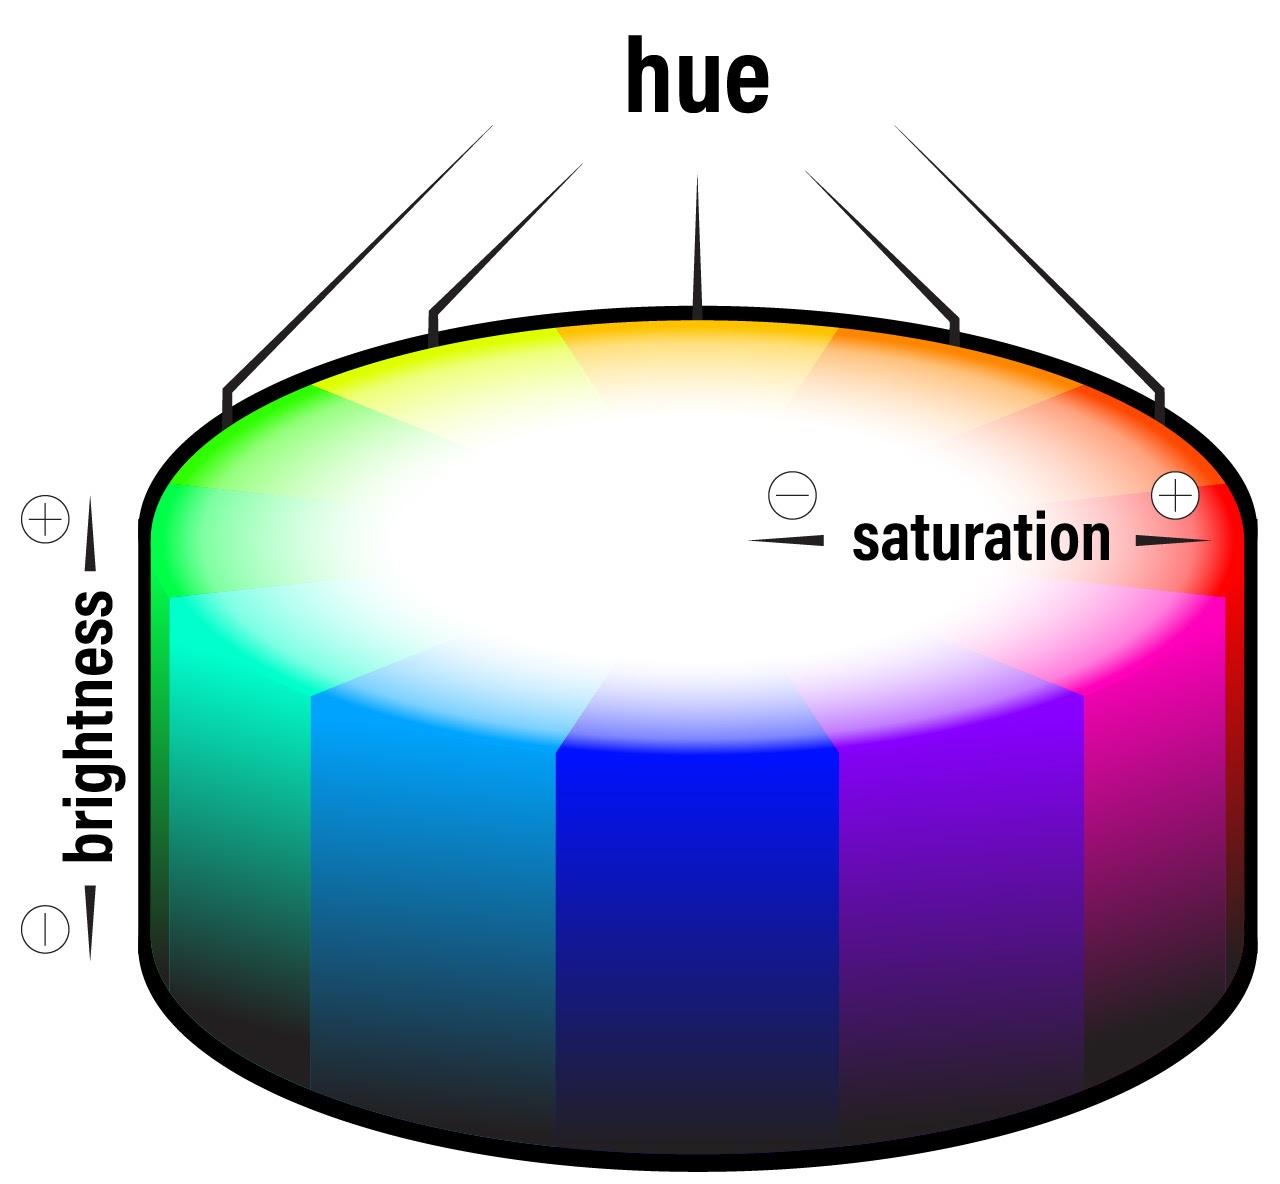 3-dimensional color wheel